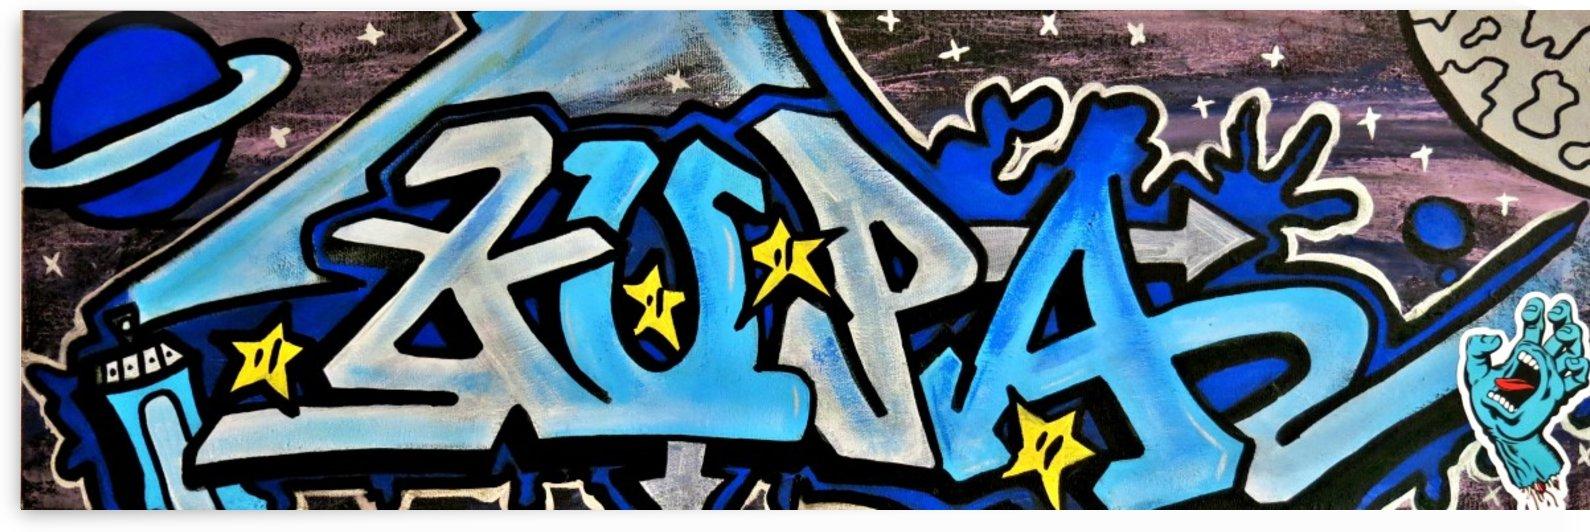 KUPA by KyLex